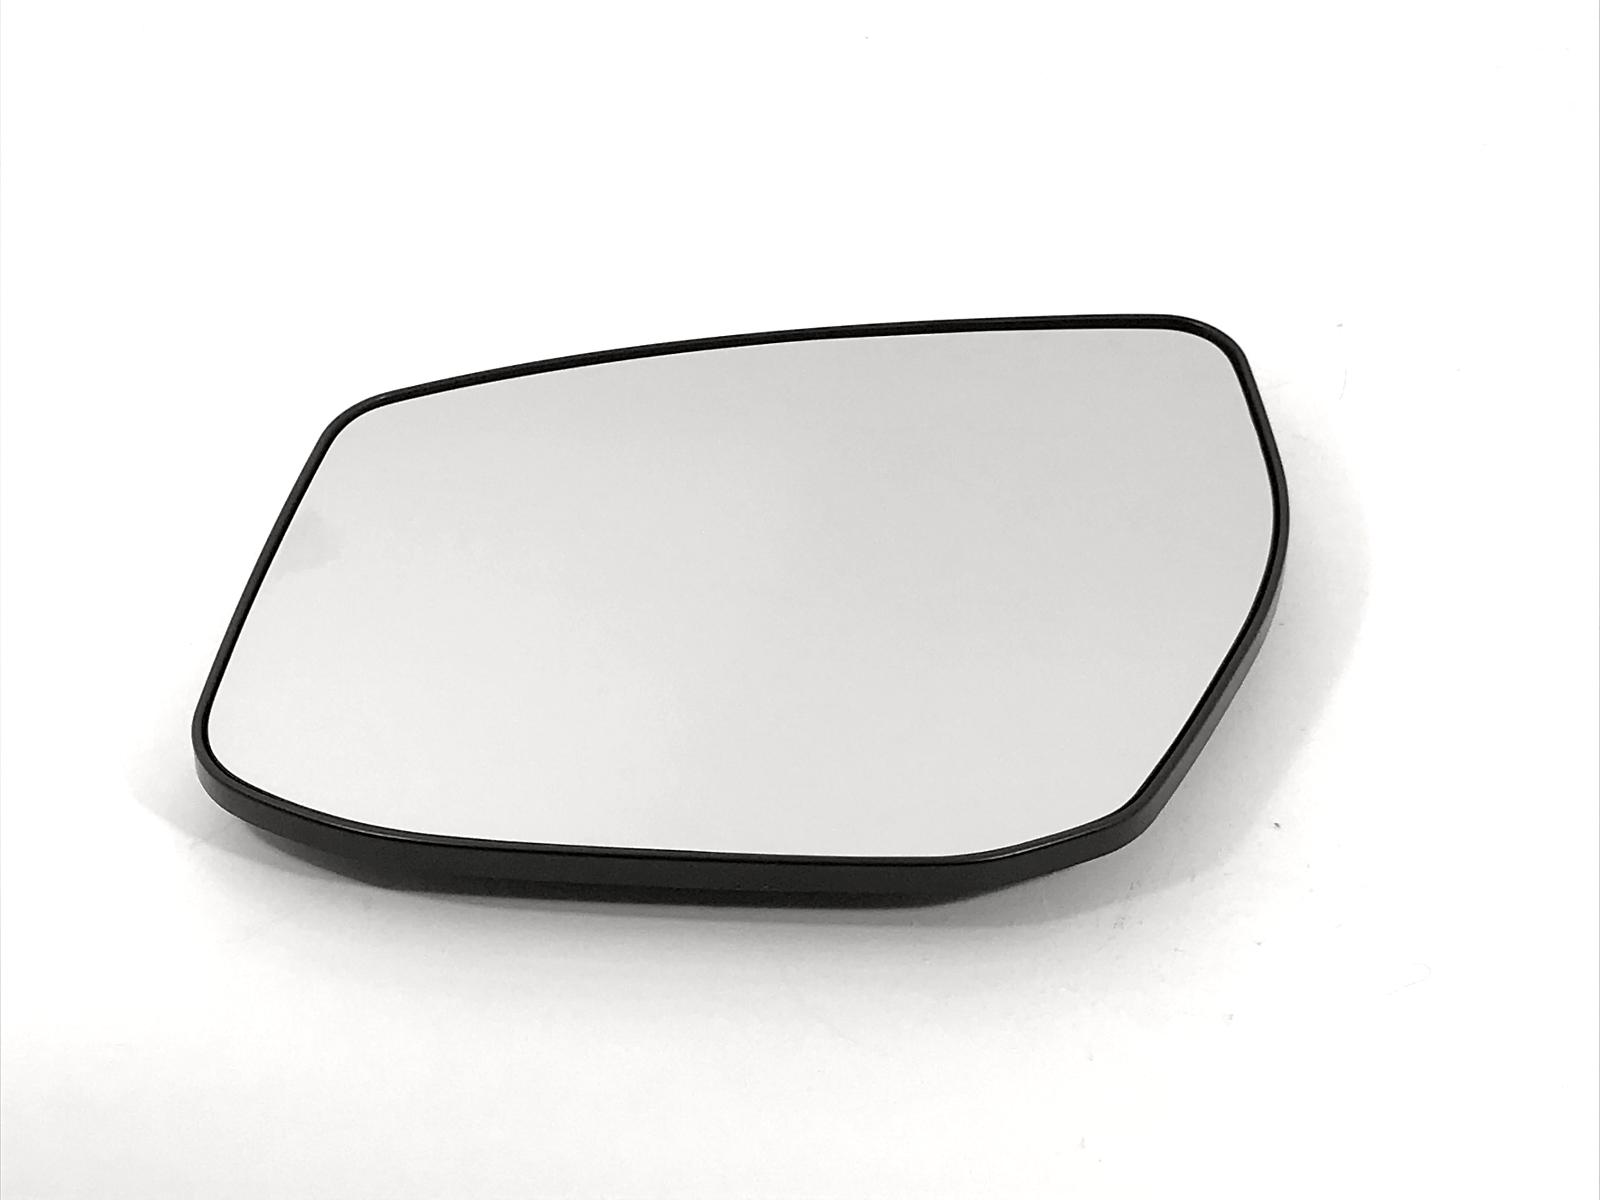 Fits 13-18 Altima Sedan, Sentra 16-18 *Maxima Driver Mirror Glass w/Holder Heat